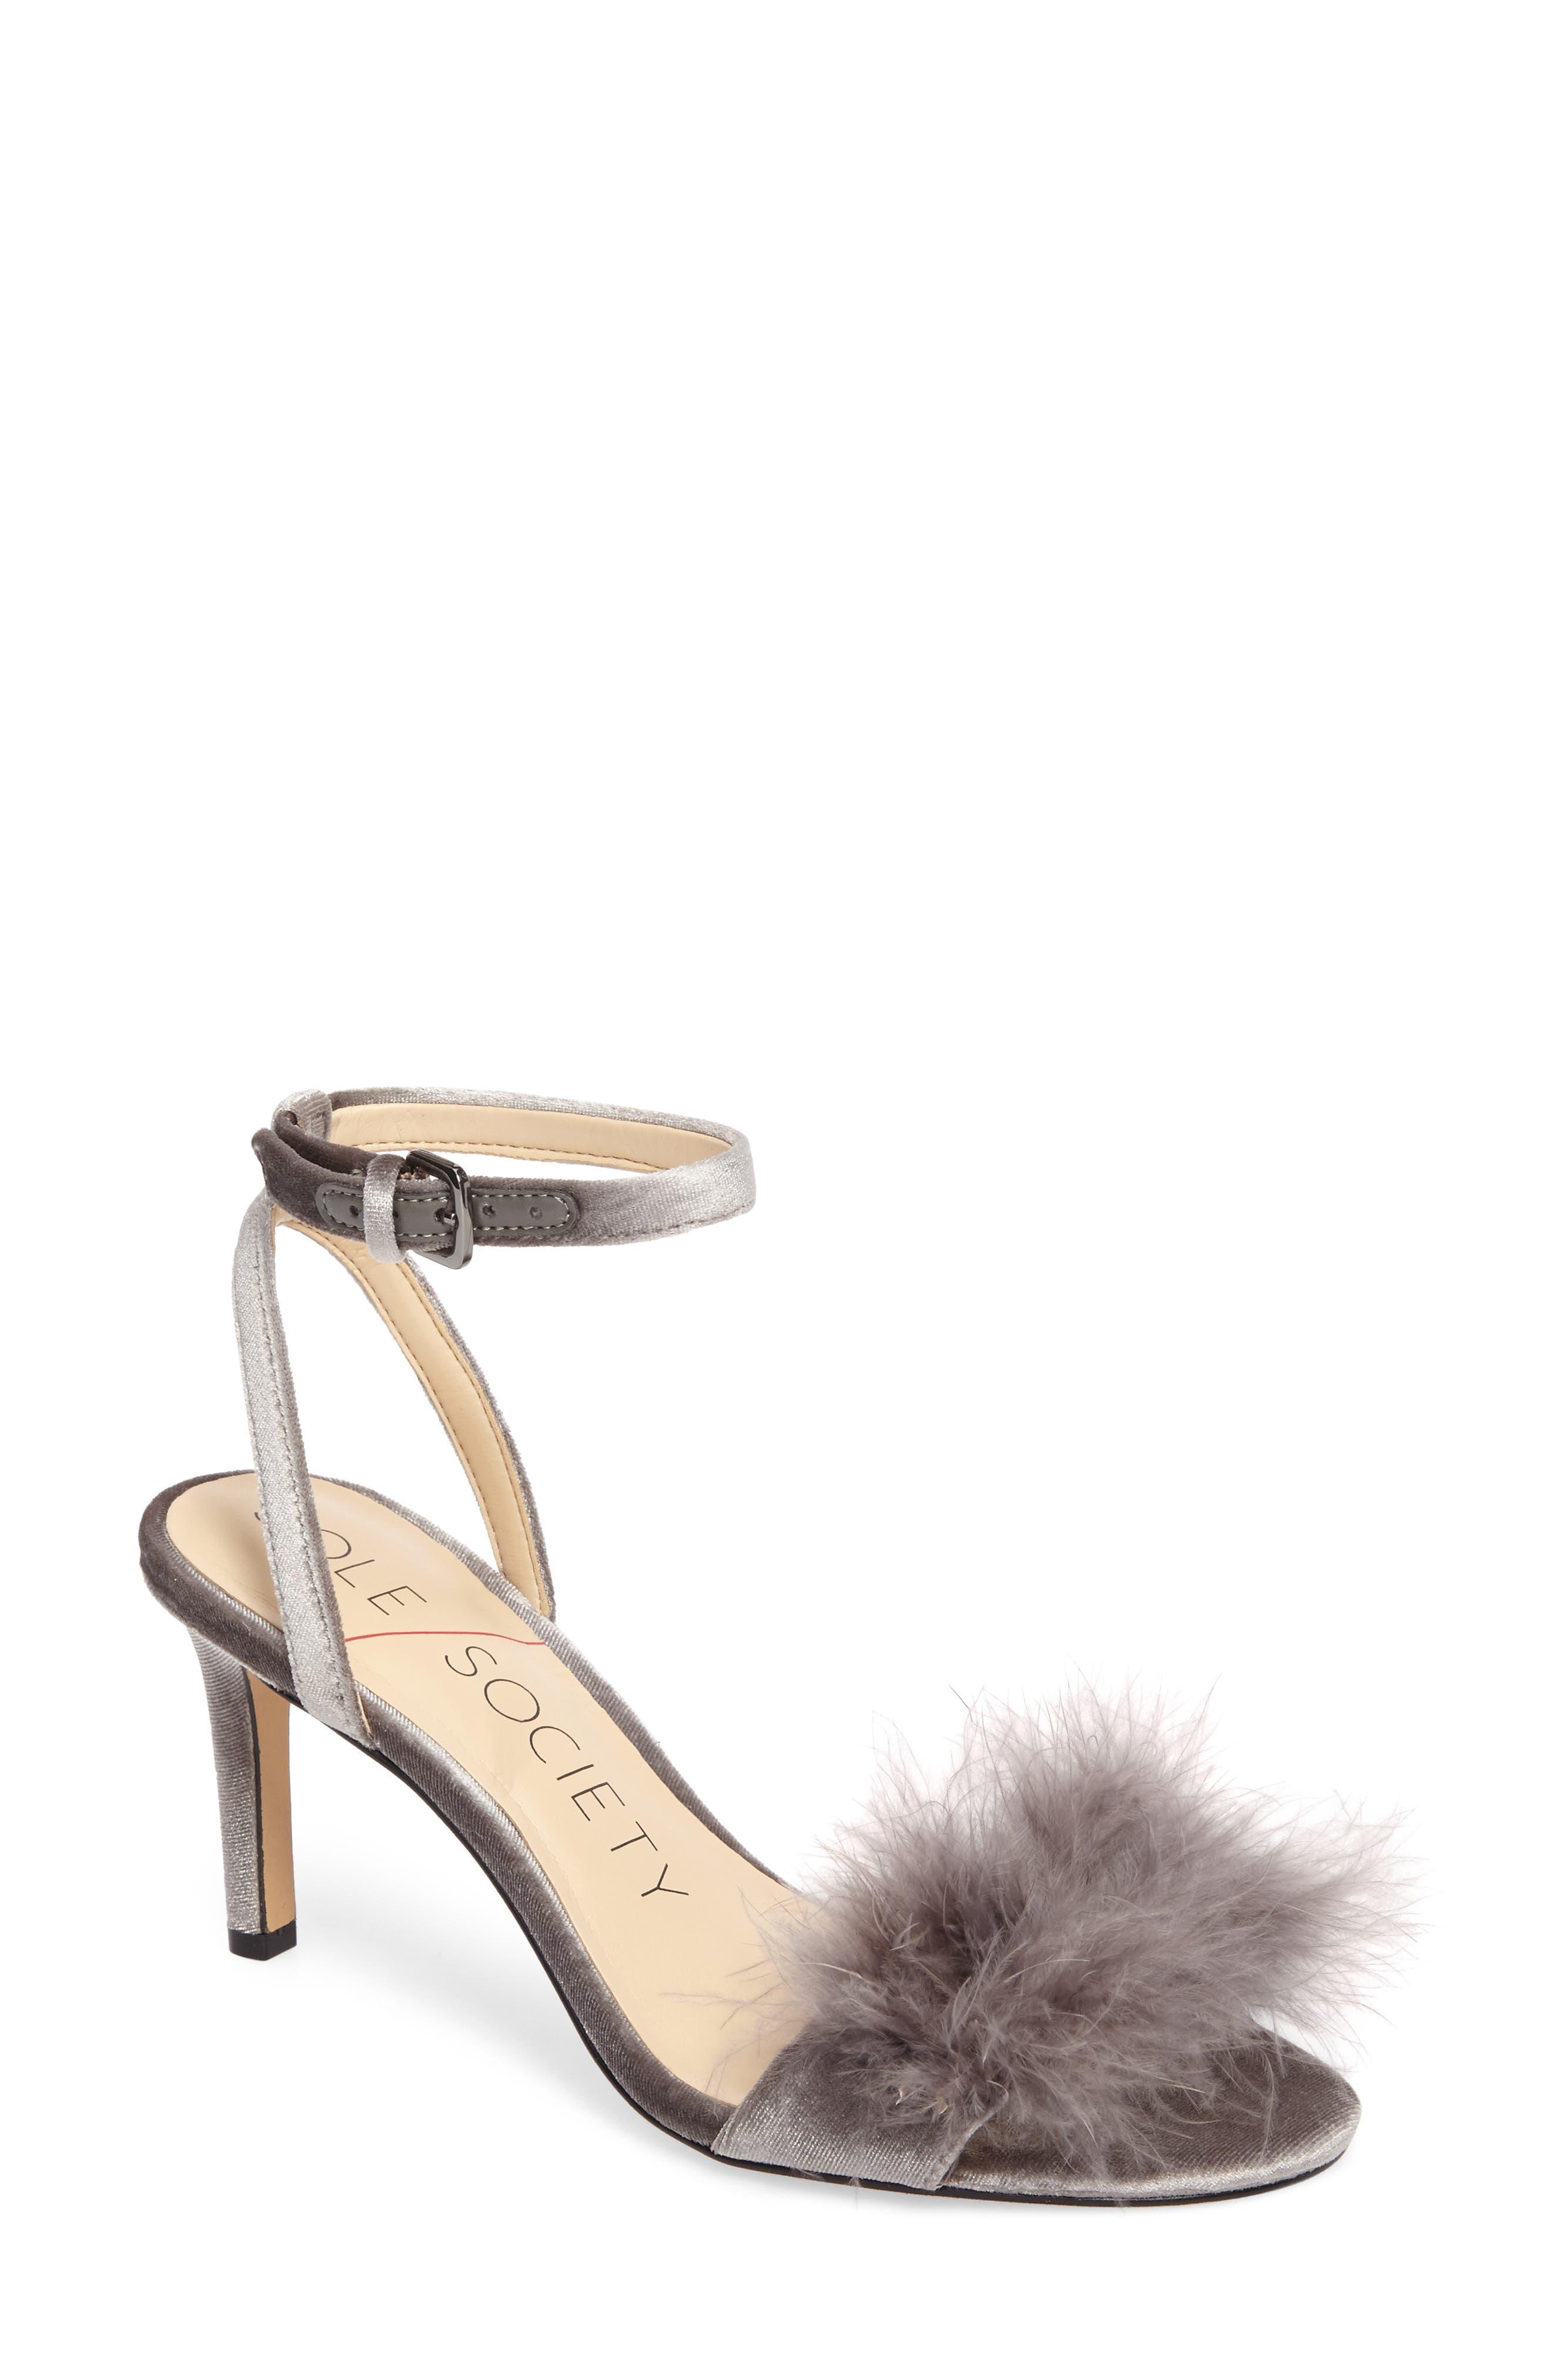 Main Image - Sole Society Lindzay Feather Sandal (Women)